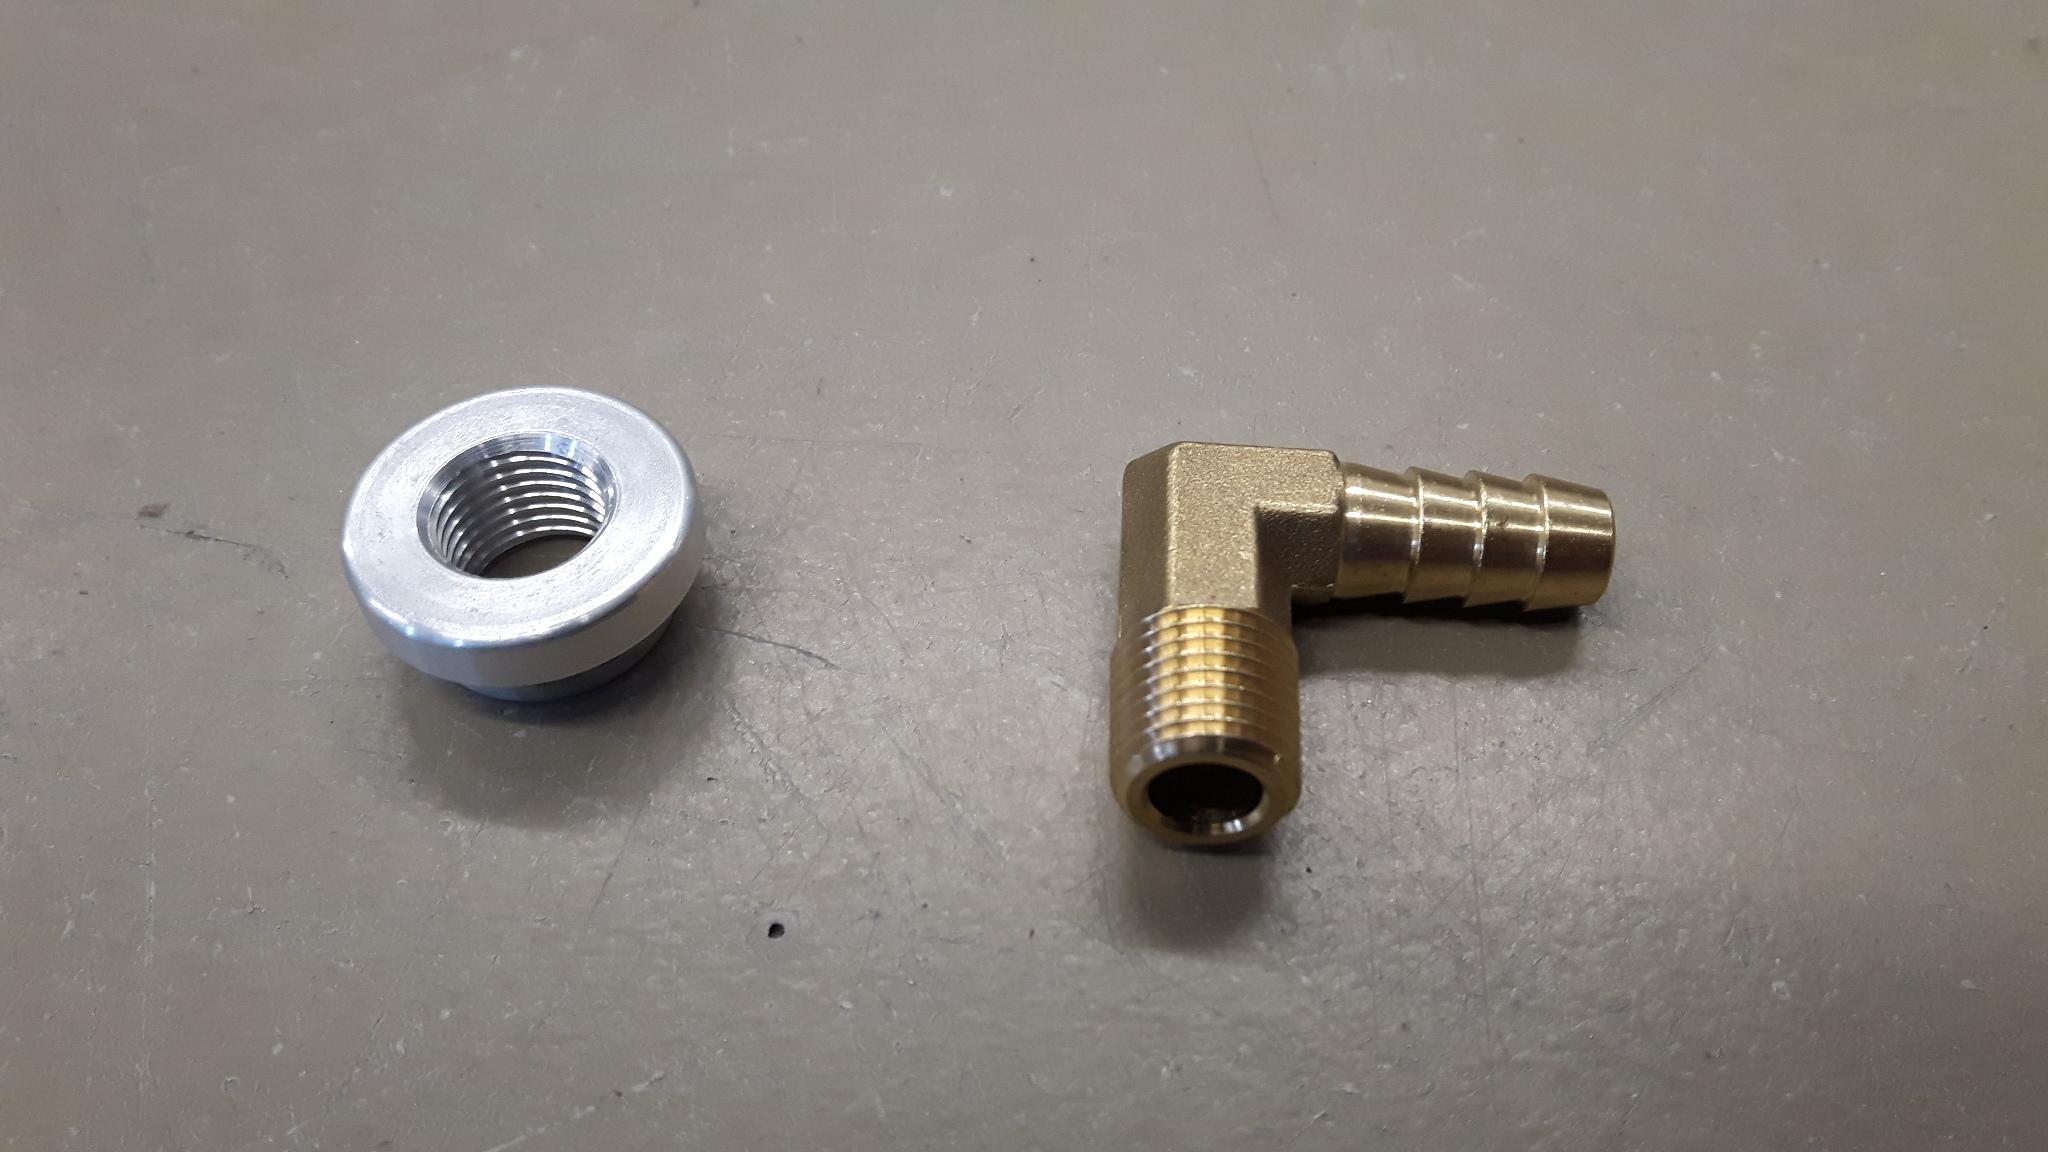 Messing haakse slangpilaar + aluminium lassok 1/4'bsp-0